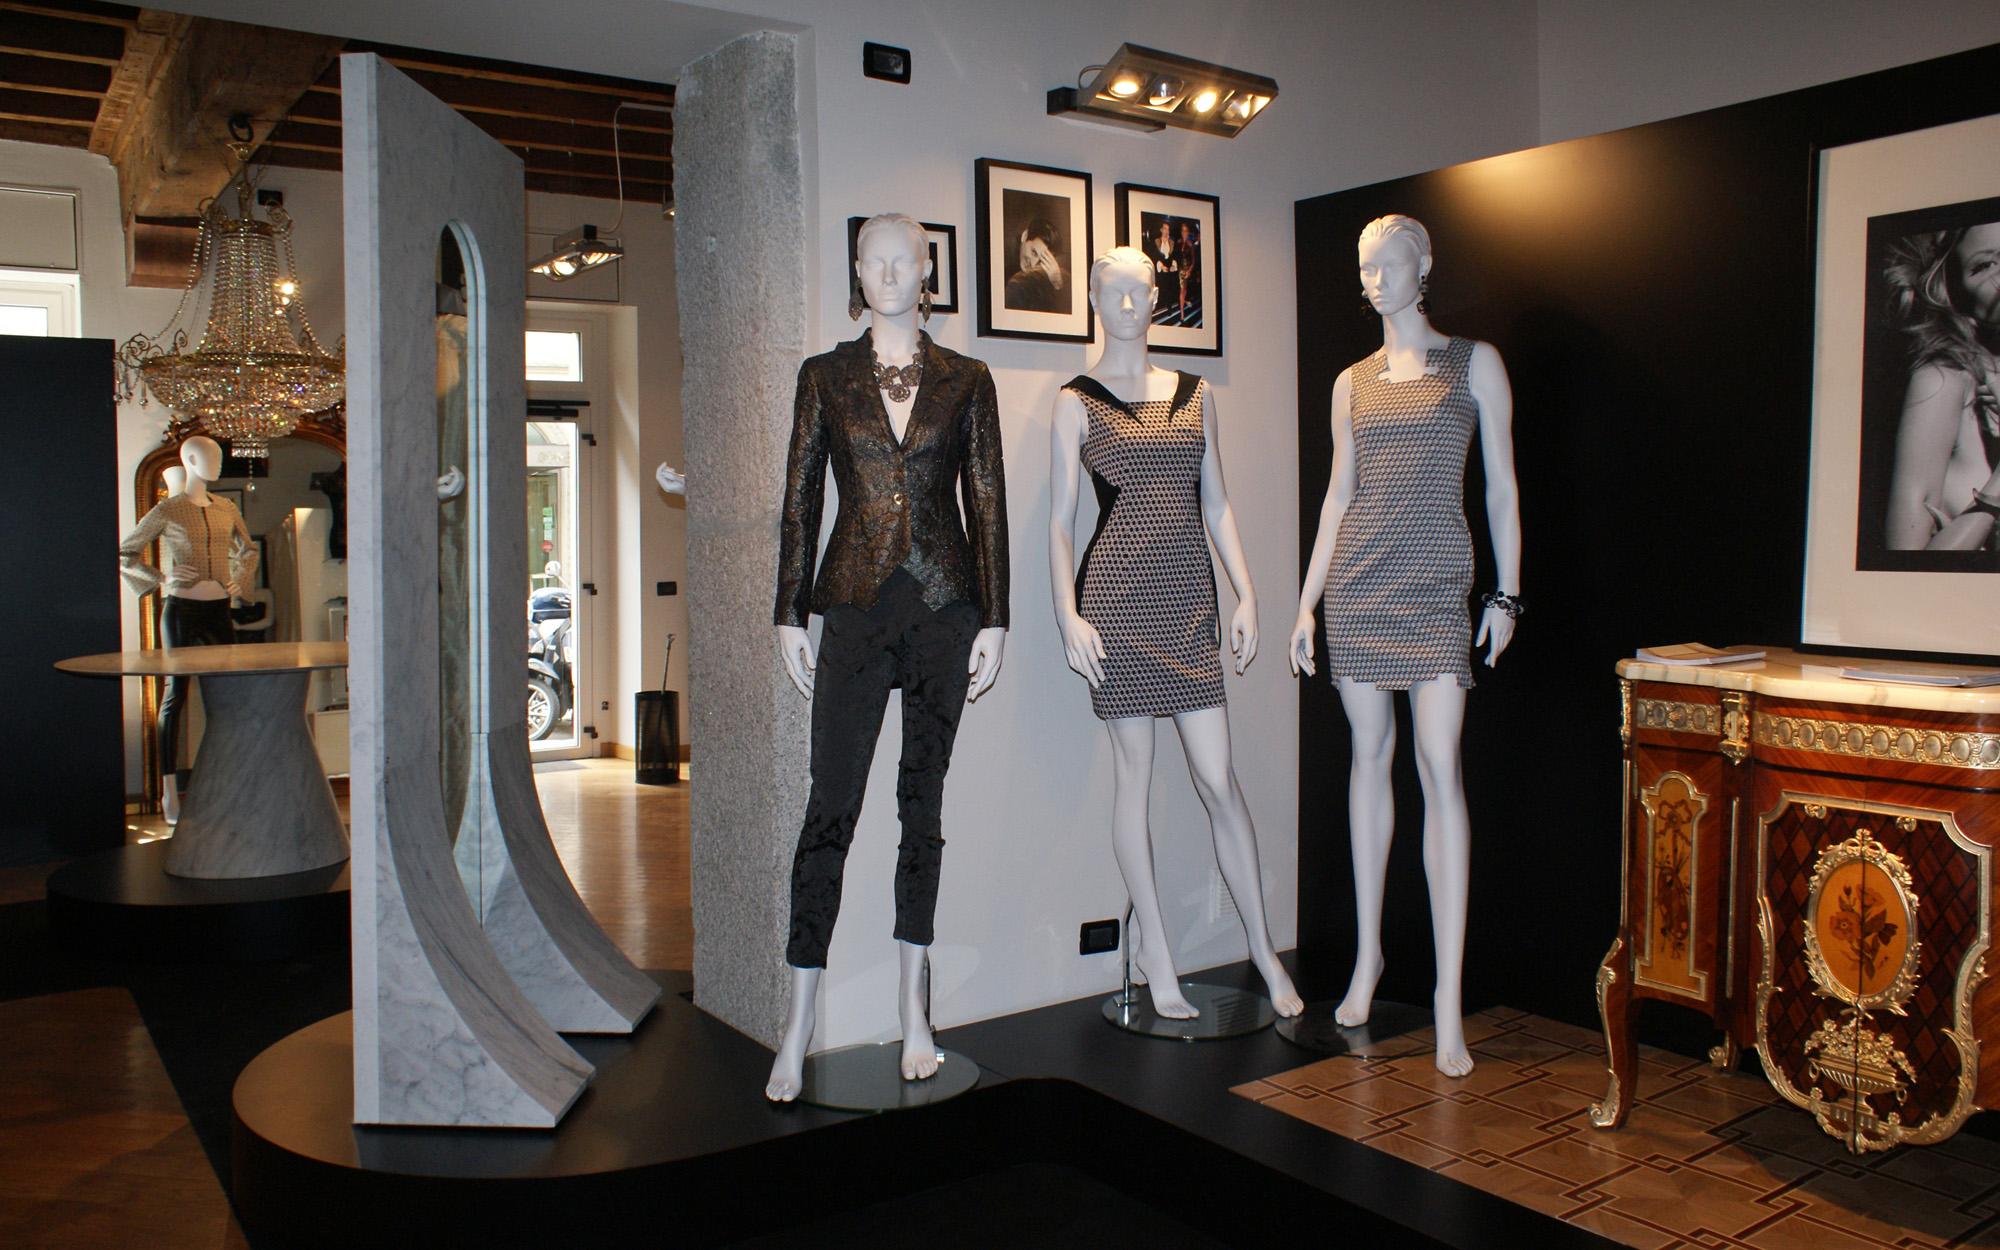 DRESS CODE: MARBLE & WOOD